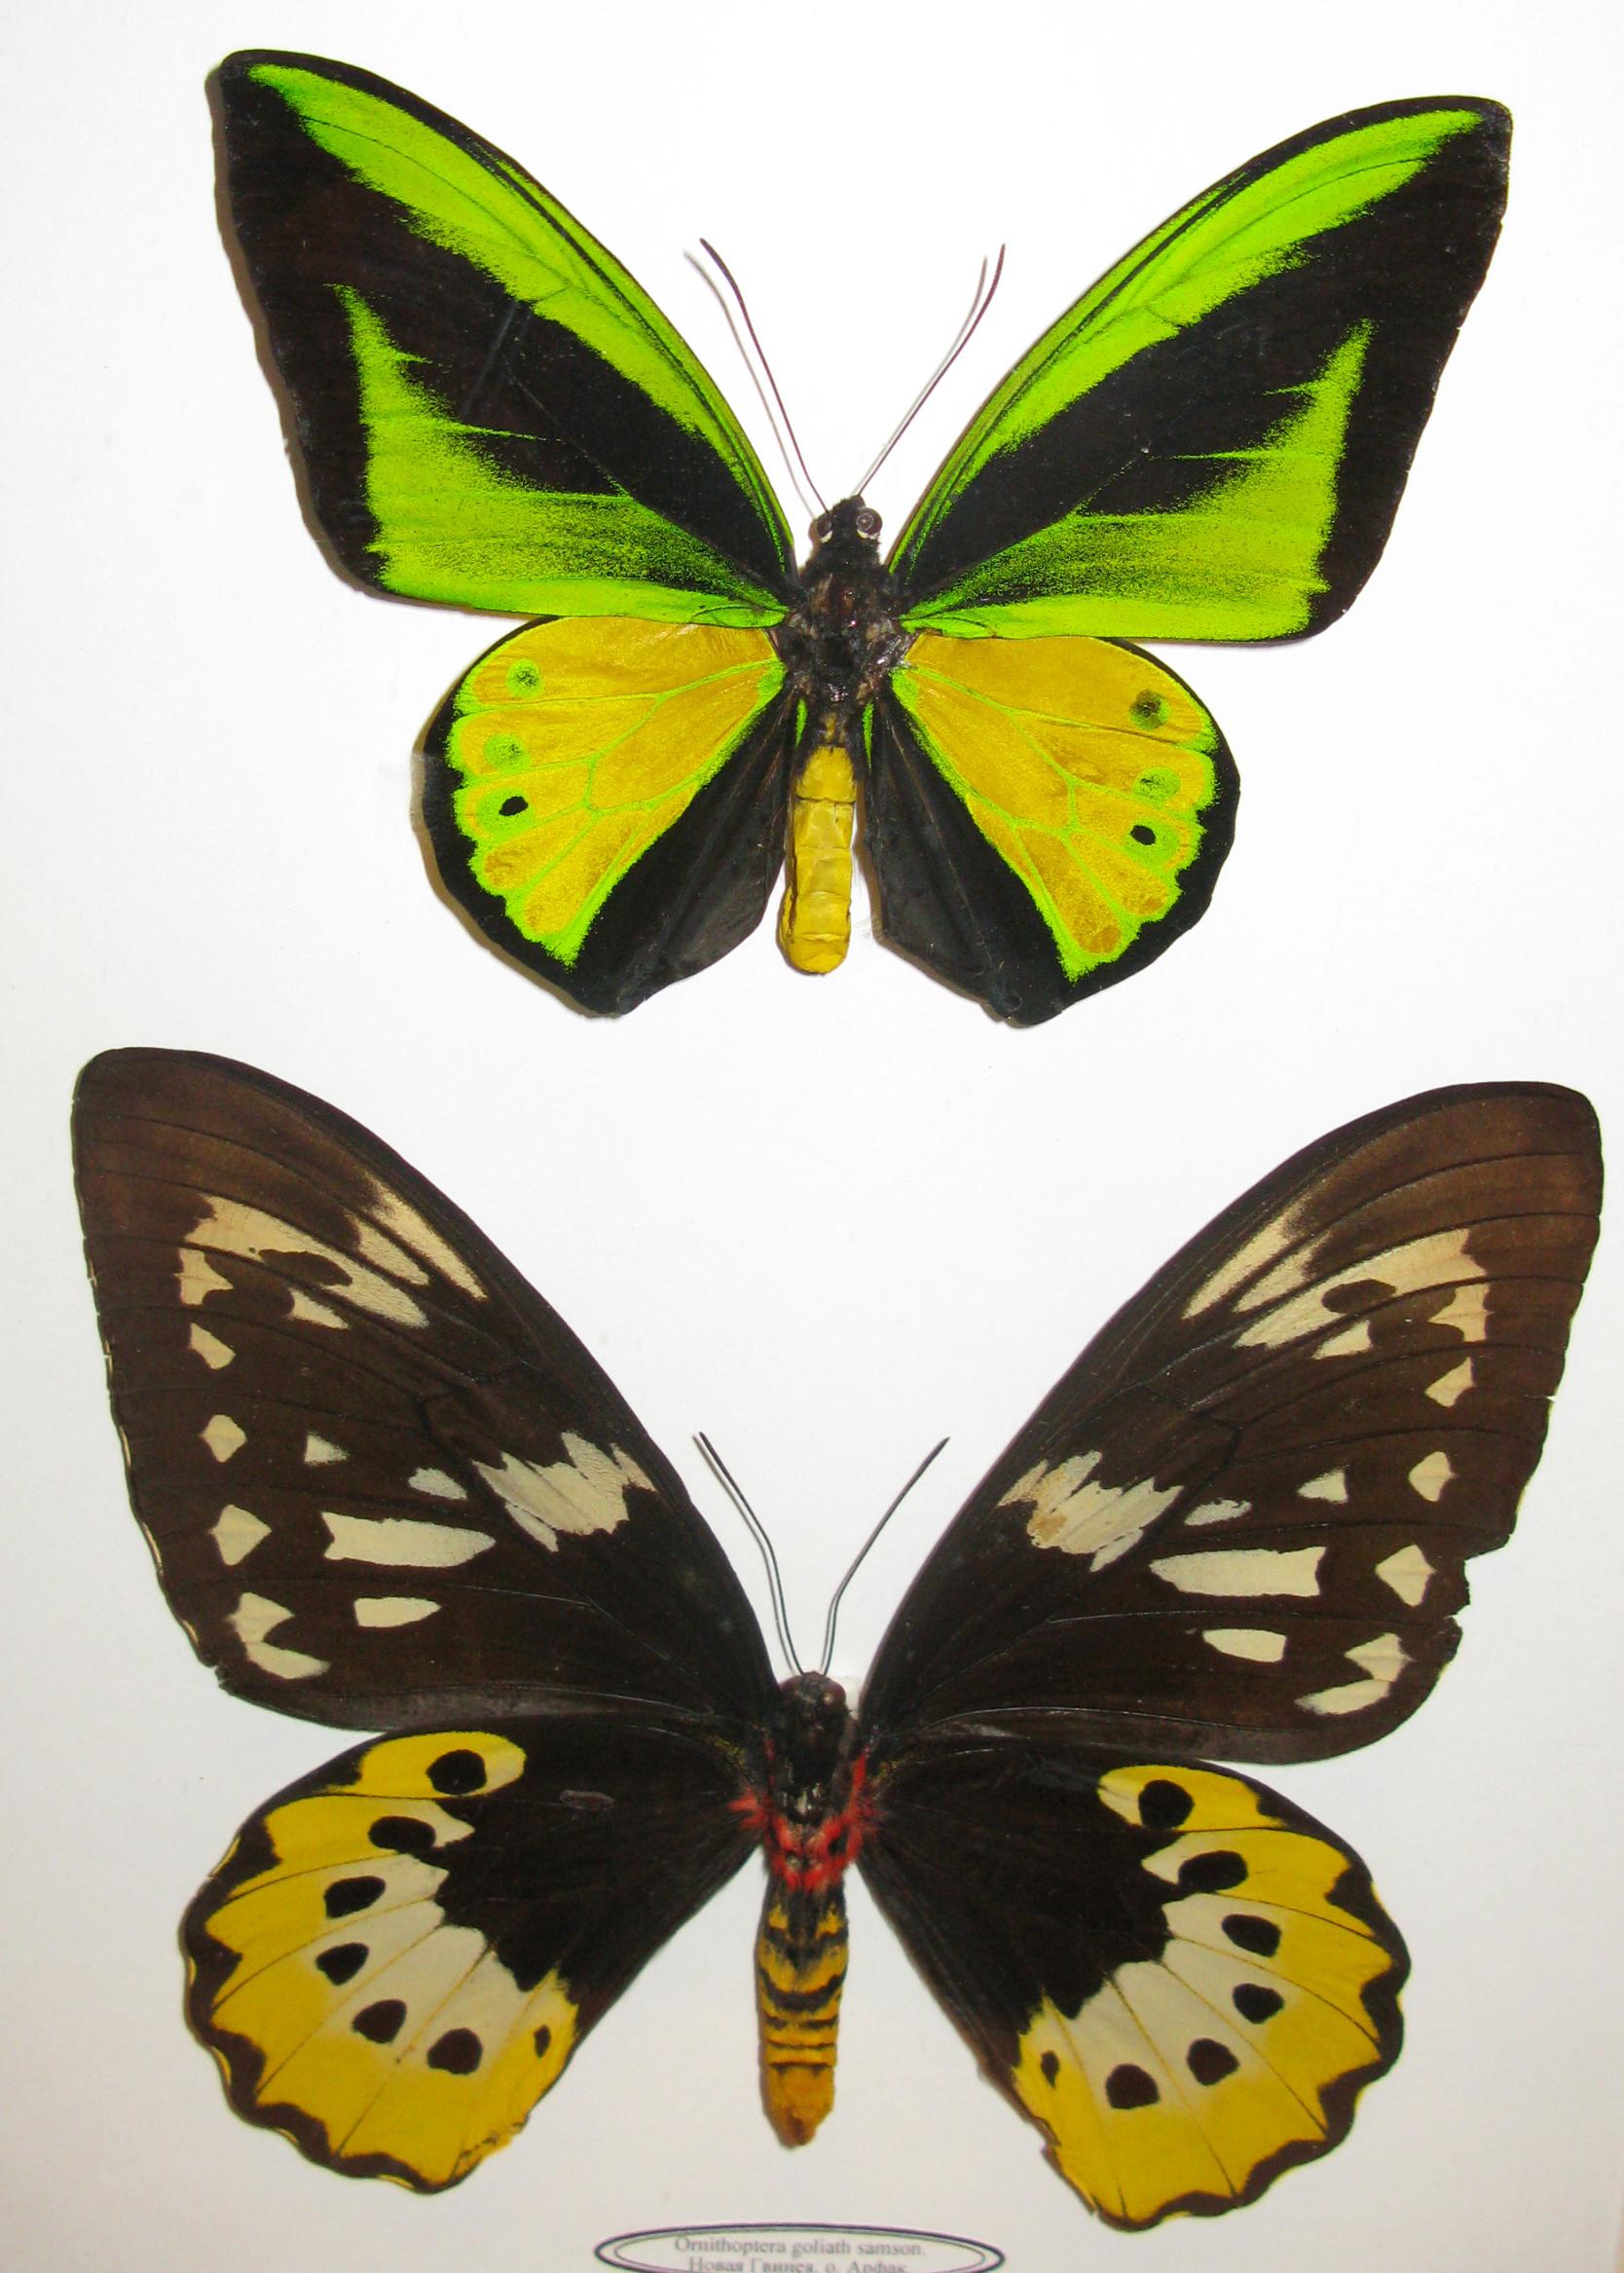 Ornithoptera goliath samson 10 pair *Indonesia*